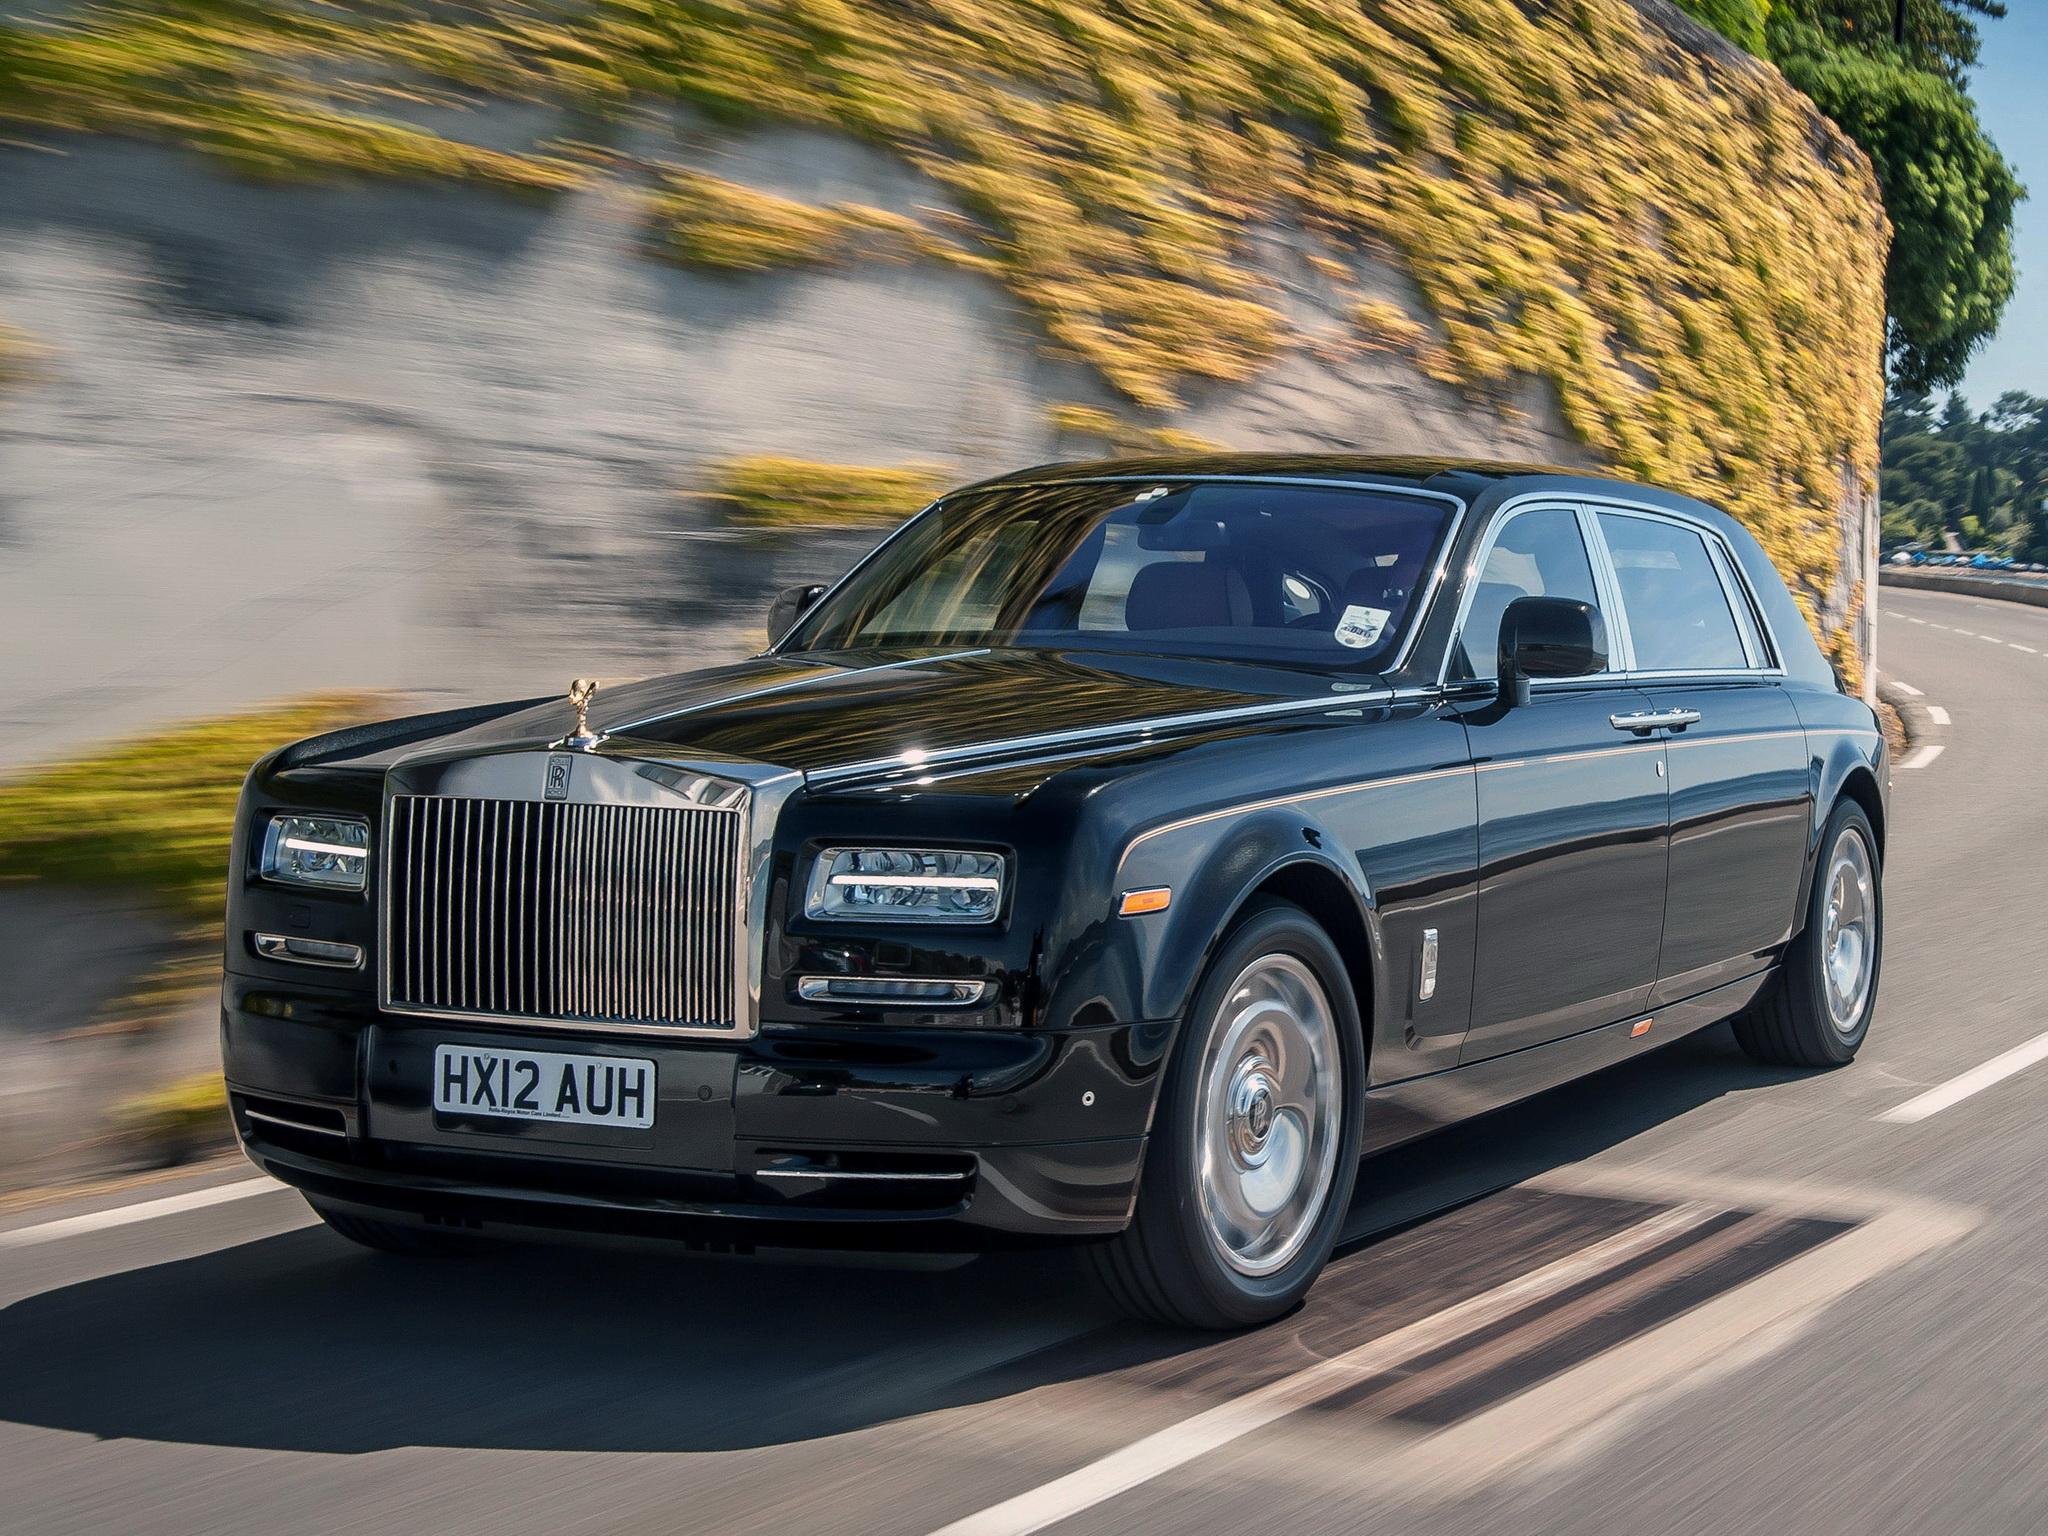 Rolls Royce Phantom Picture 95941 Rolls Royce Photo Gallery